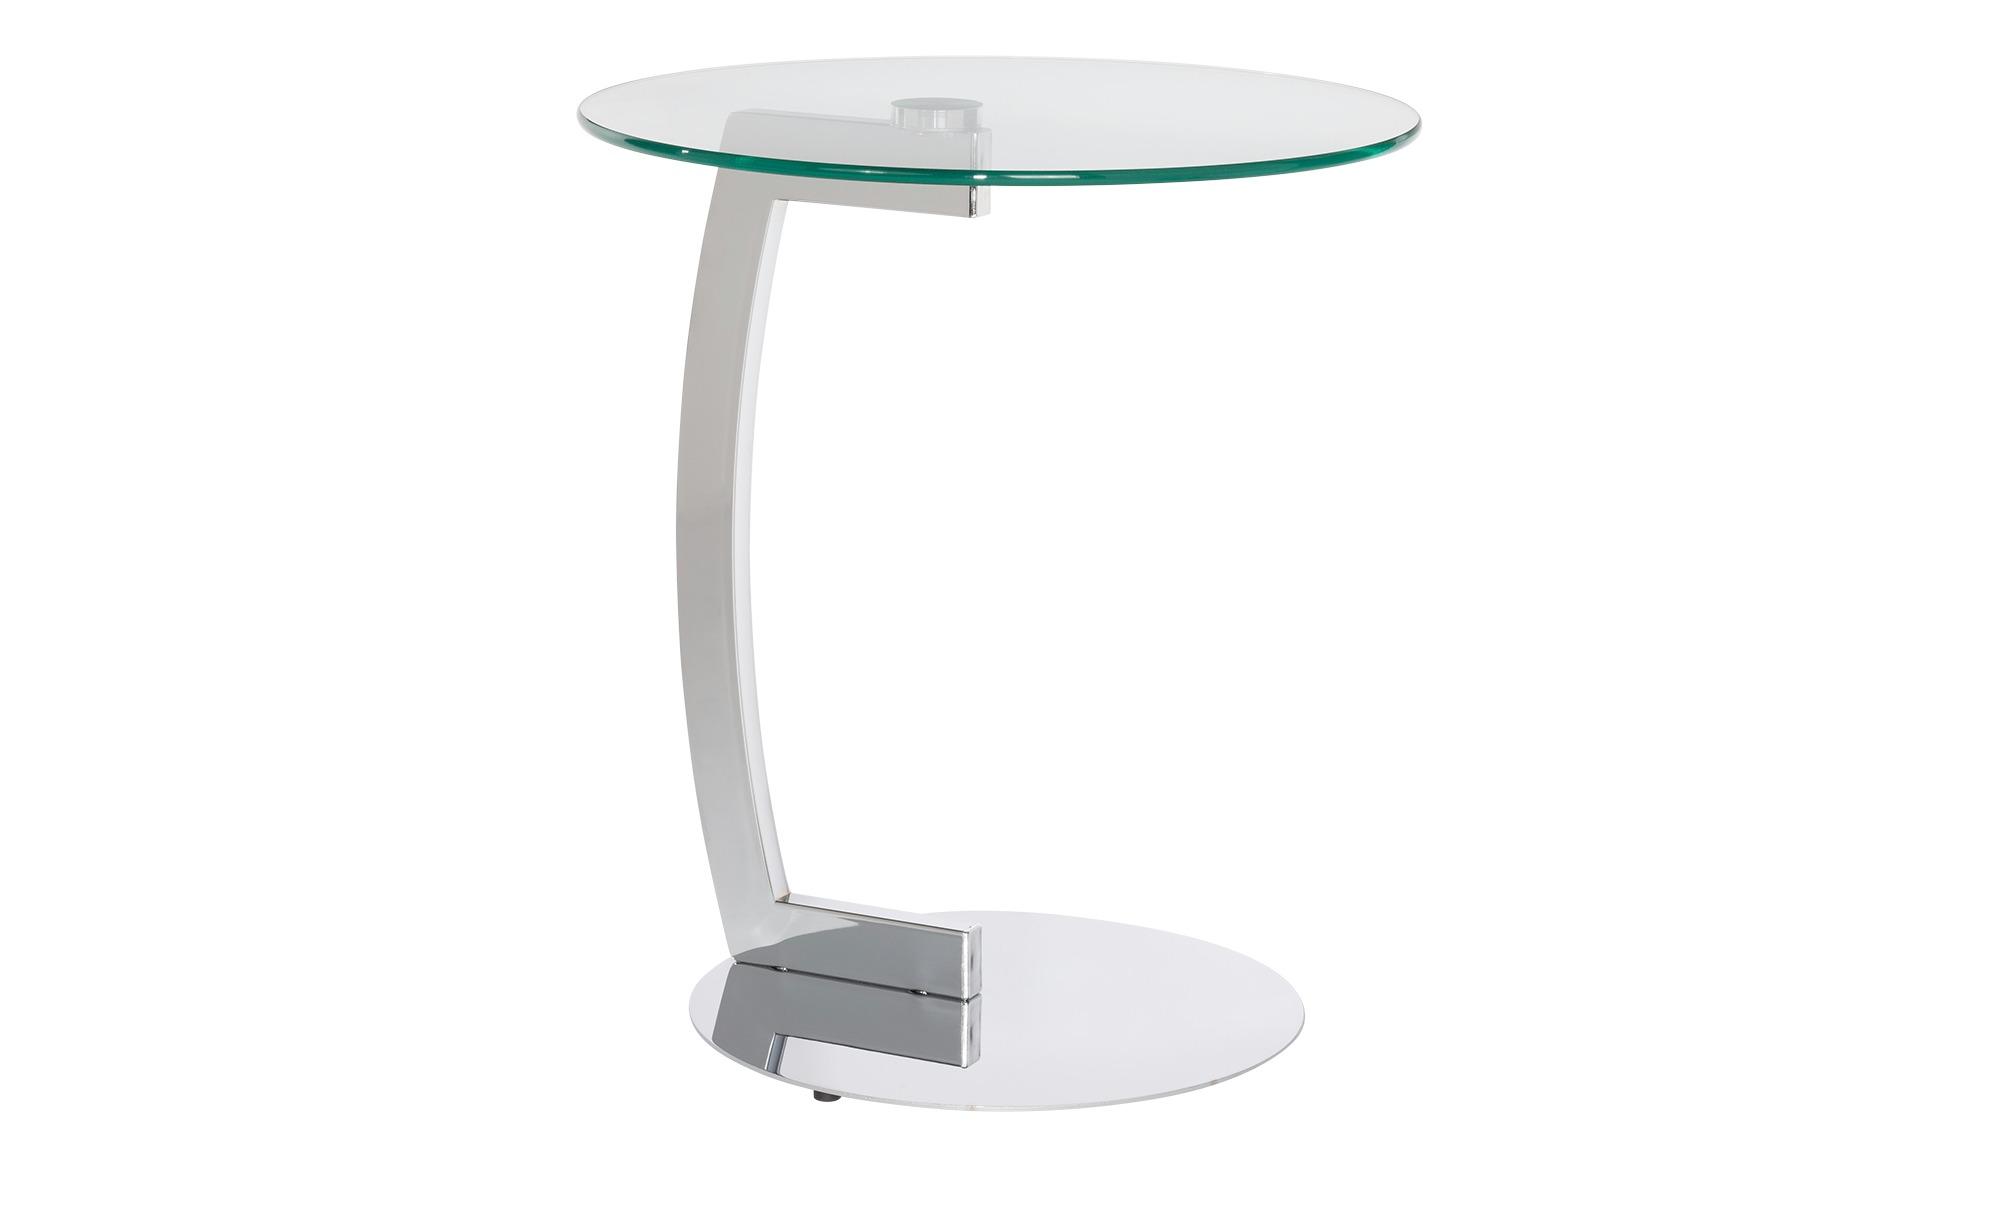 Beistelltisch Metall Glas  Asja ¦ transparent/klarØ: 45 Tische > Beistelltische > Beistelltische ohne Rollen - Höffner